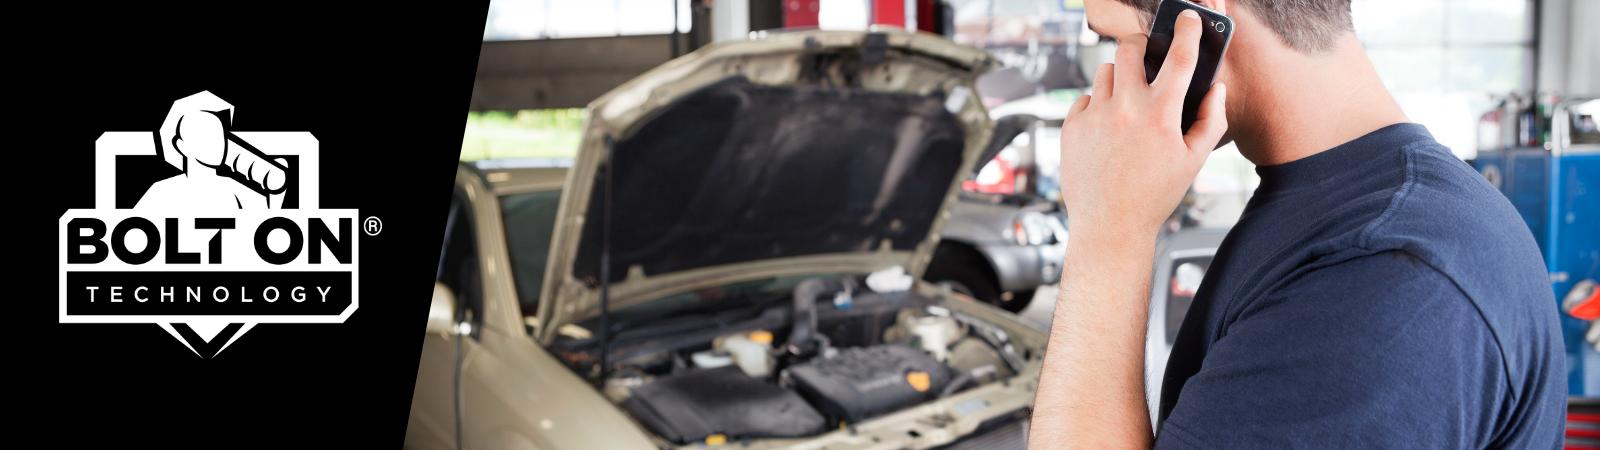 Improving Phone Calls at Your Auto Repair Shop